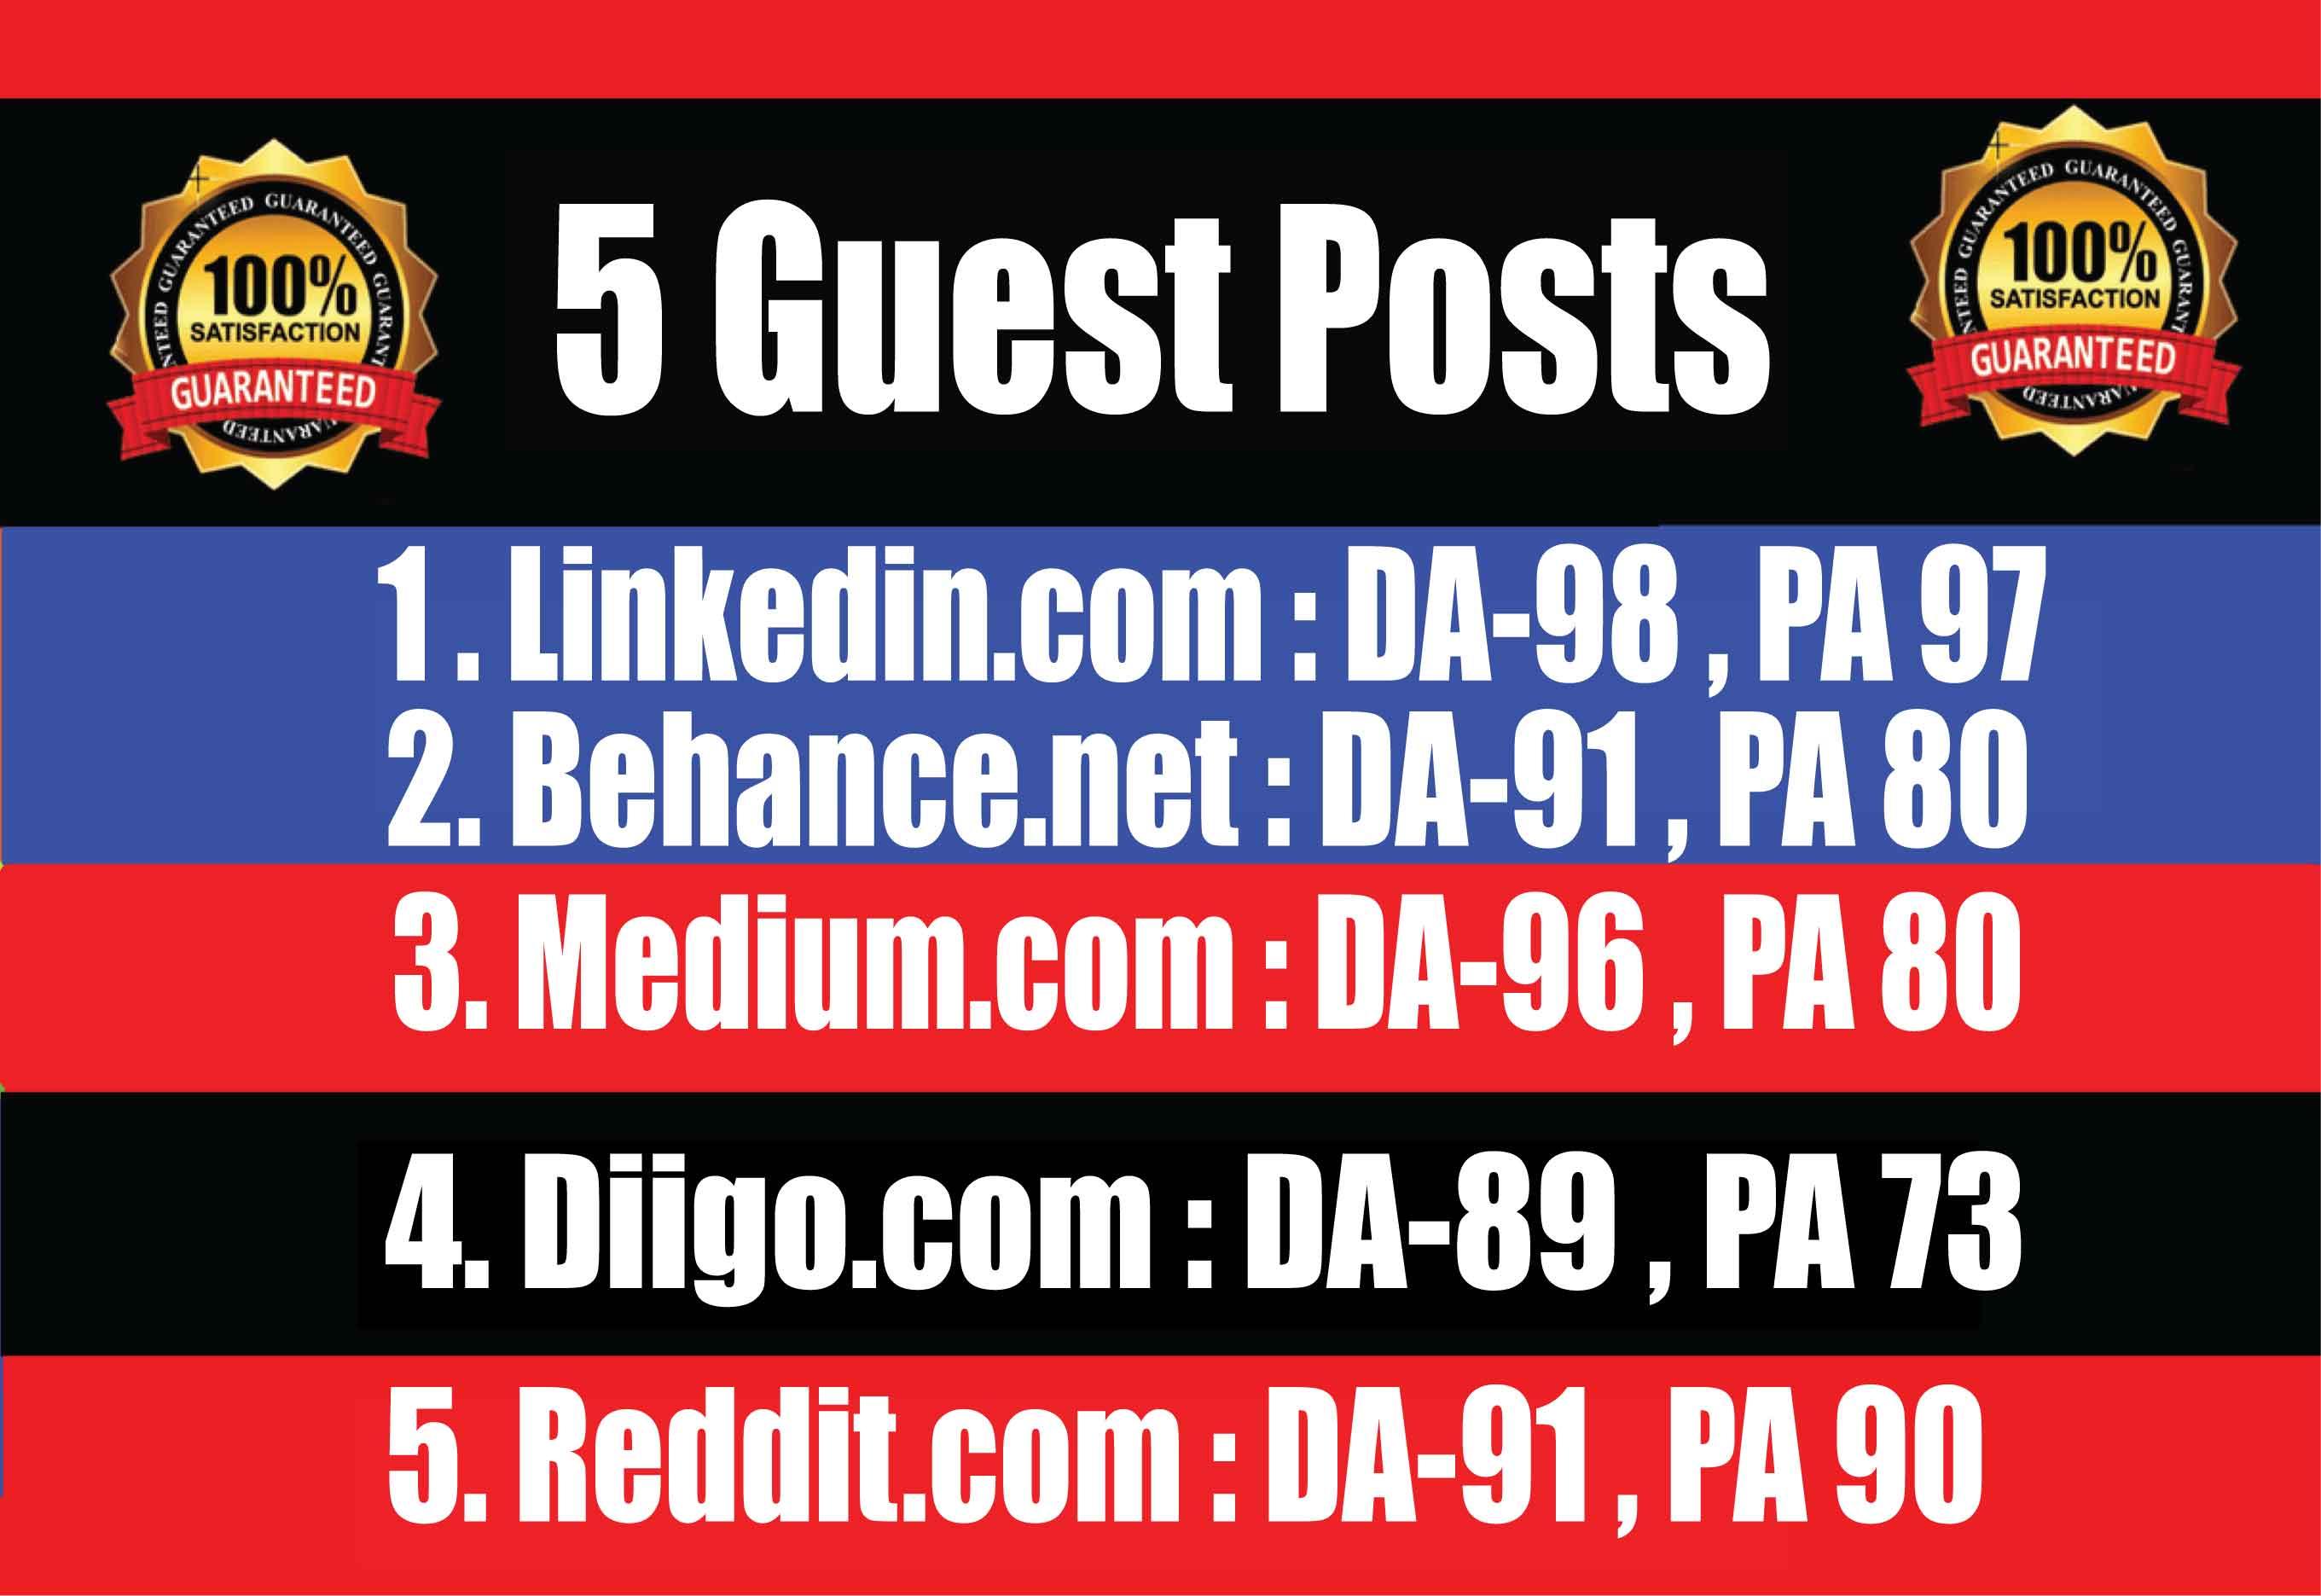 Publish 5 Guest Posts on Linkedin,  Behance,  Medium,  Diigo,  Reddit - High TF CF DA PA Blogs